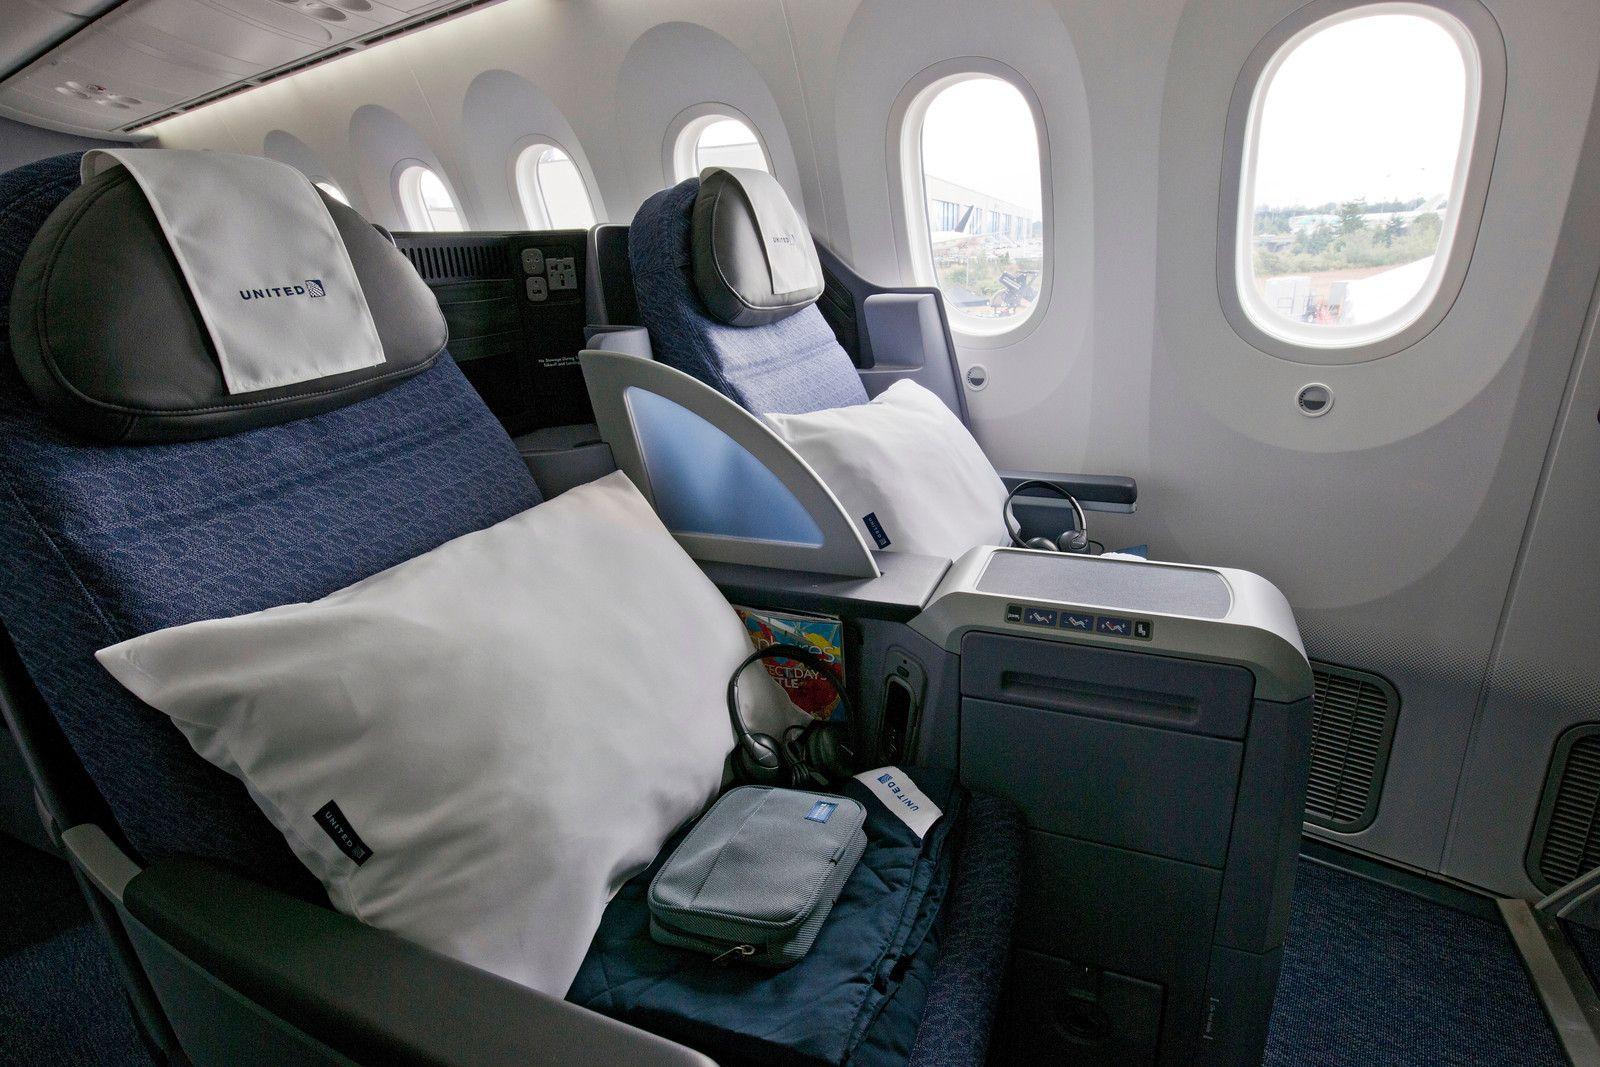 Boeing 787 interior coach viewing gallery - 787 Dreamliner Interior United 787 Dreamliner Interior_4